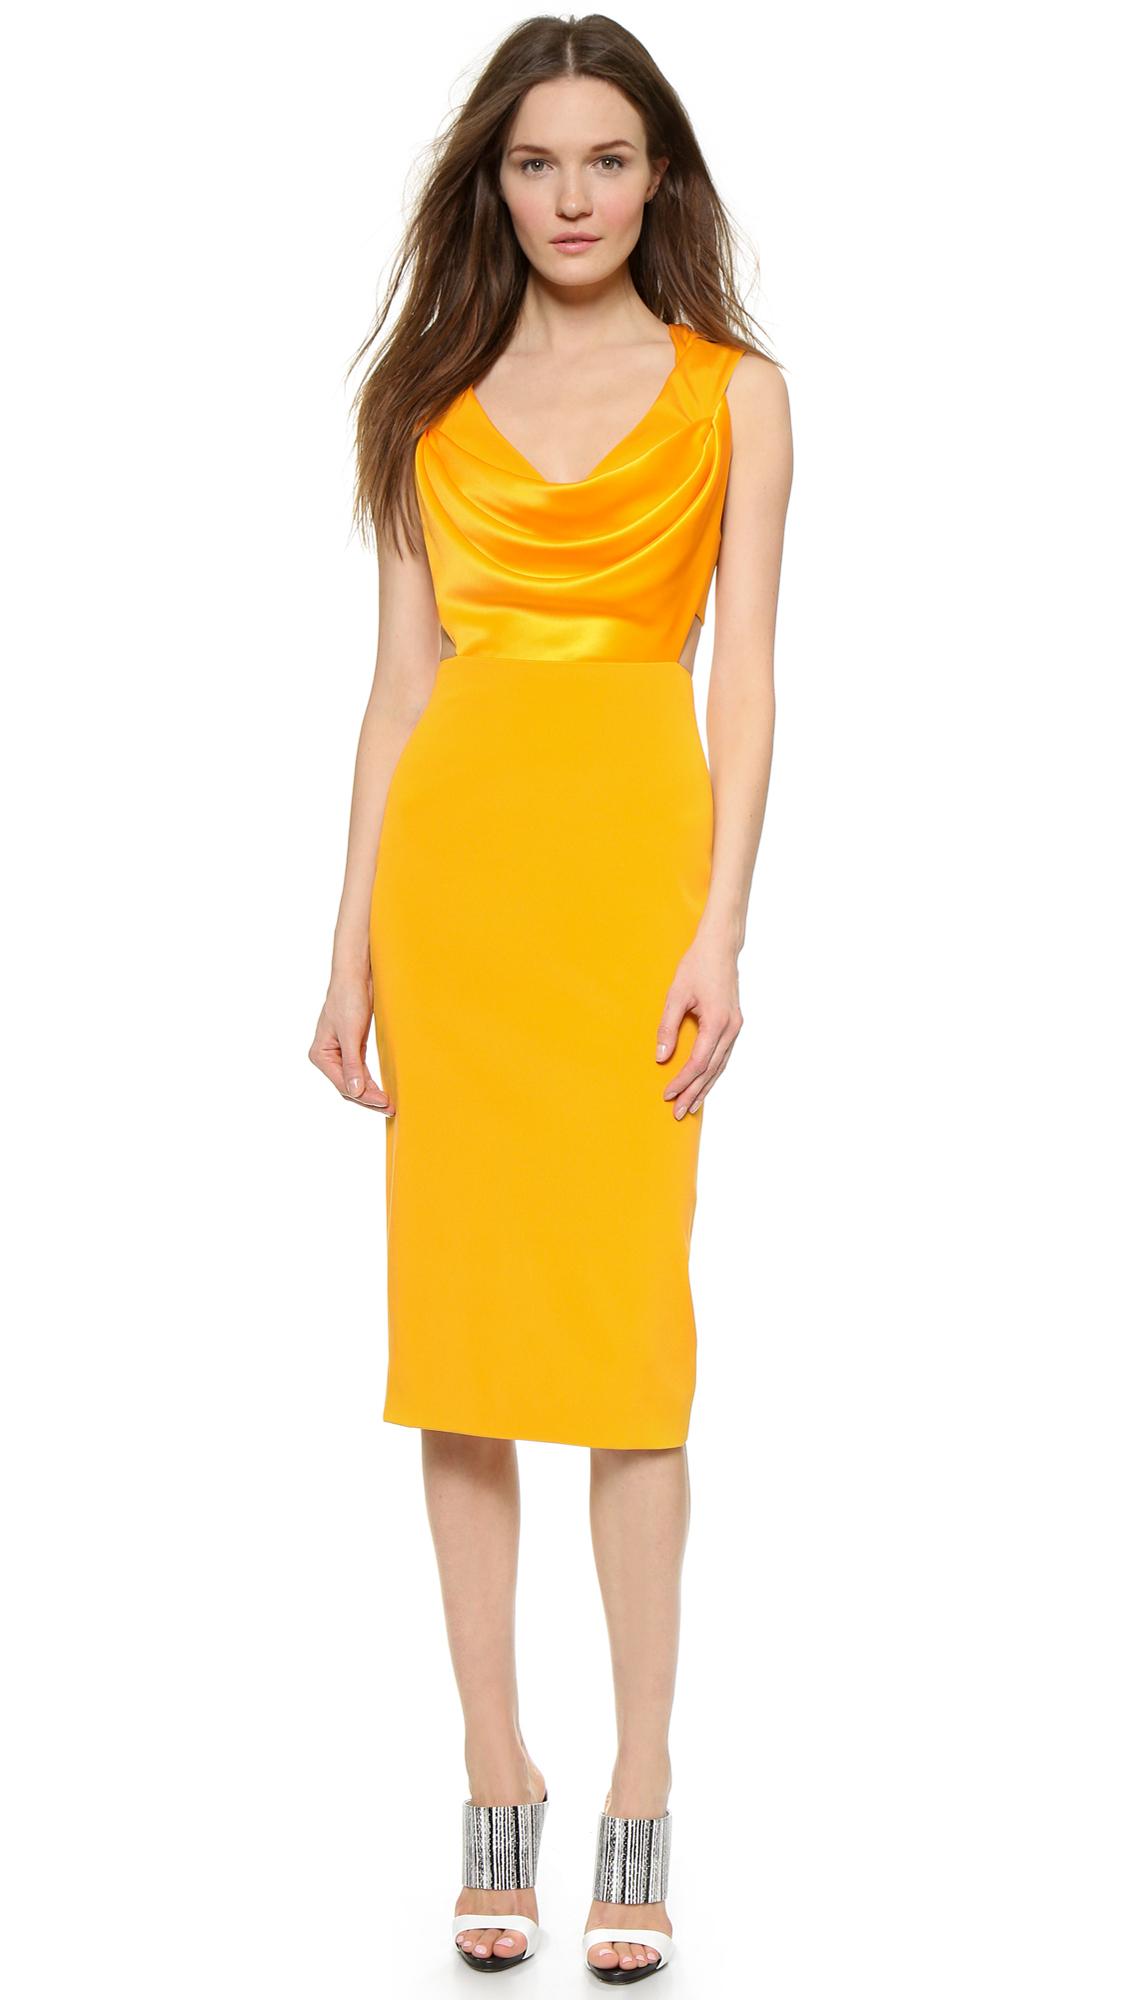 c887cd6ca111 Cushnie et Ochs Sleeveless Dress - Marigold in Yellow - Lyst